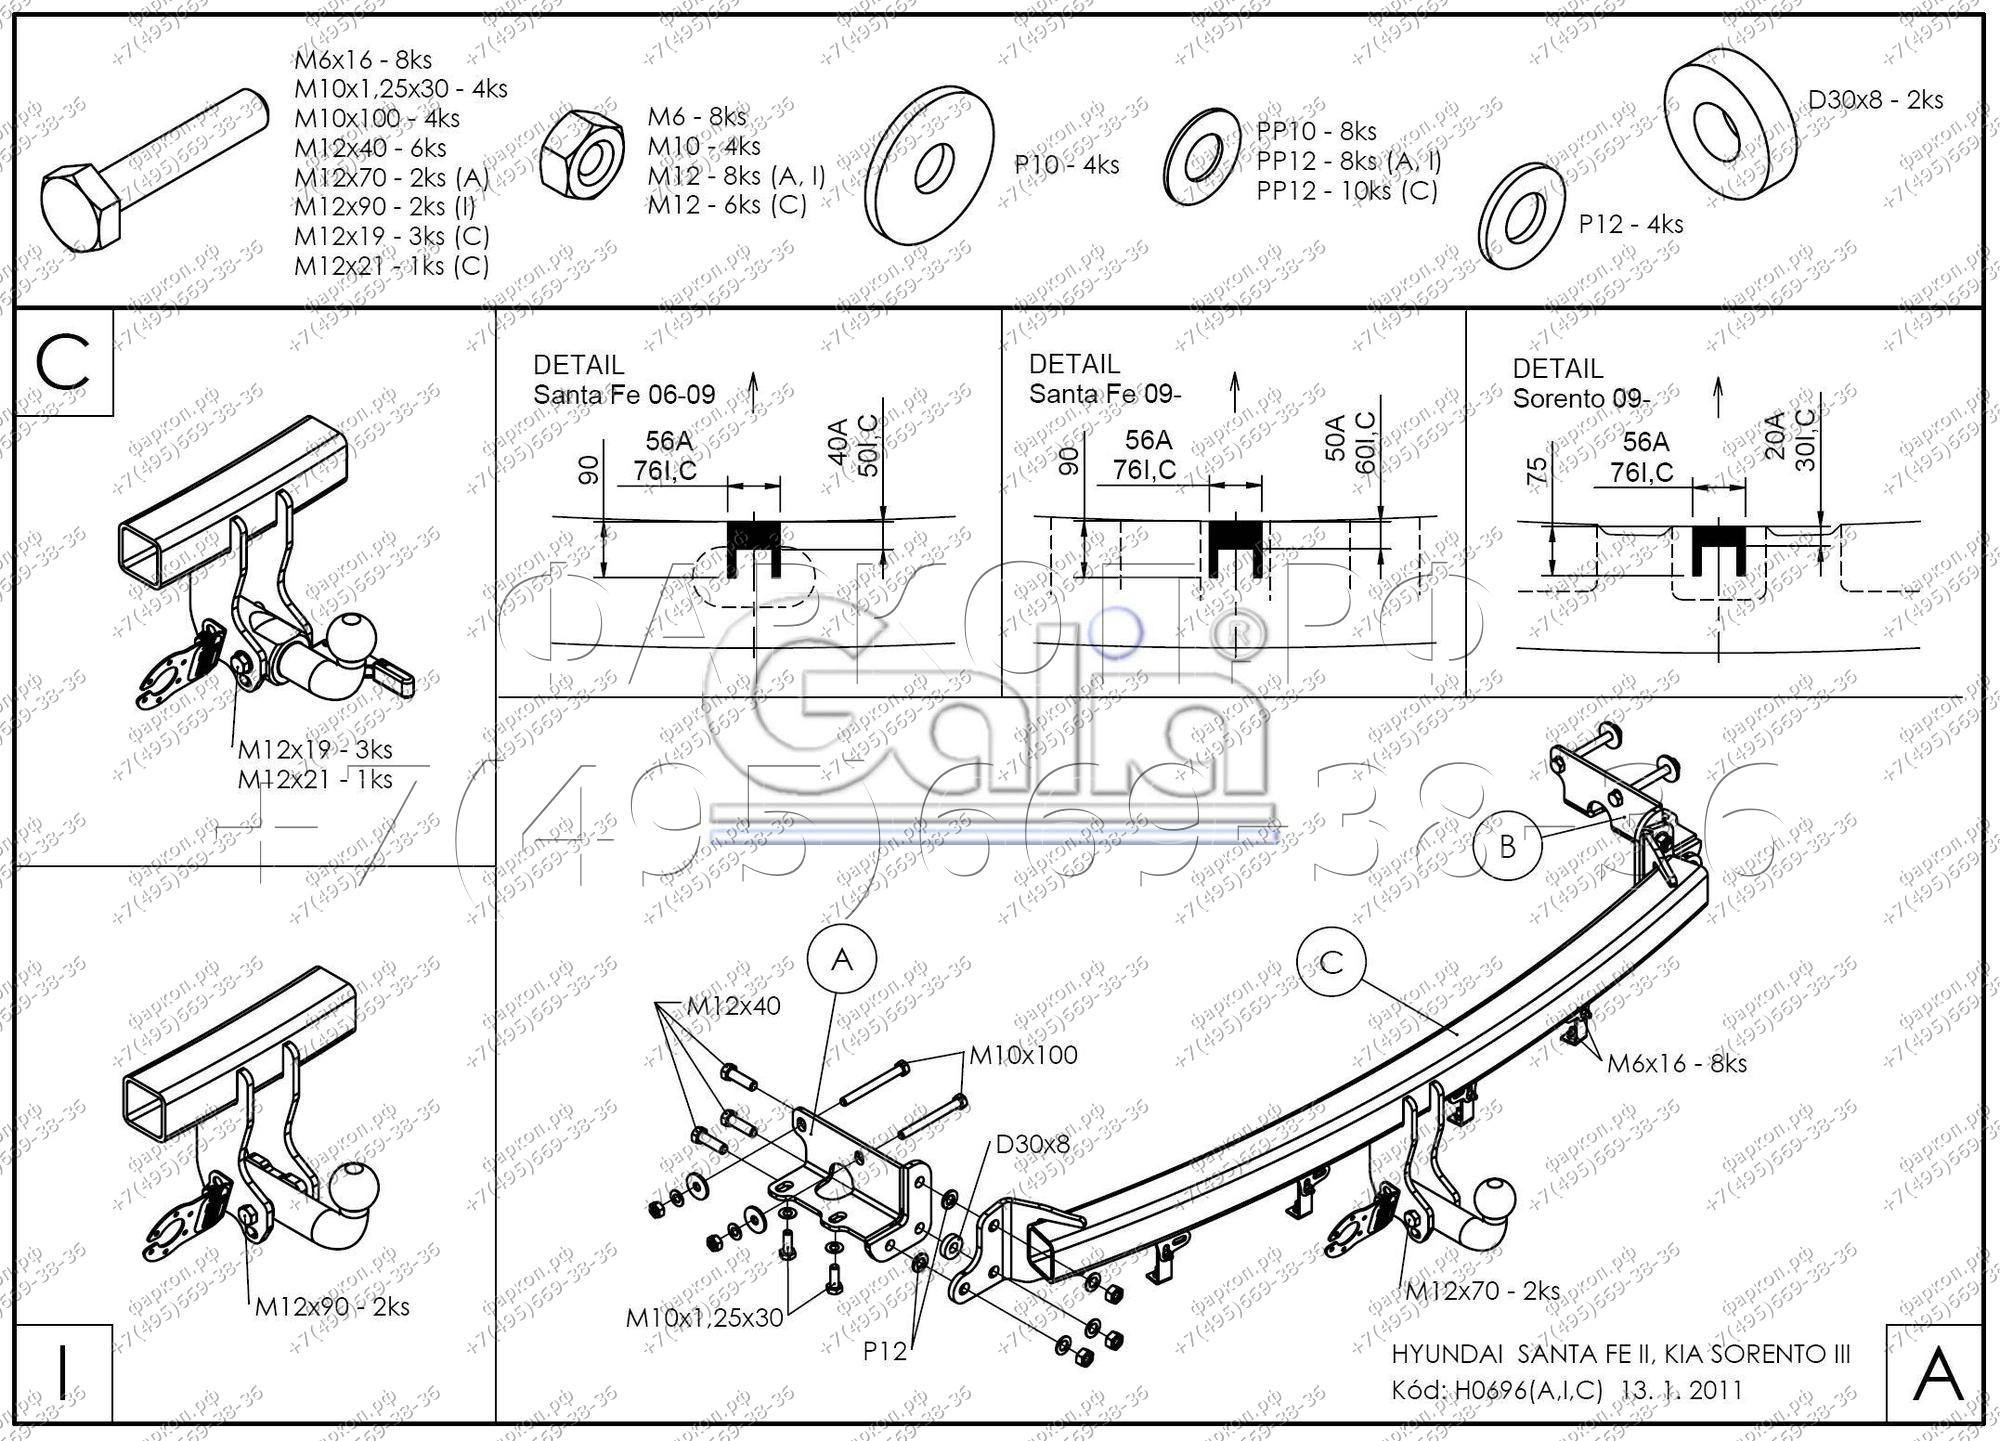 Полностью ОЦИНКОВАННЫЙ фаркоп на Hyundai Santa Fe 2006-2012, Kia Sorento 2009-2012.  Тип шара: A. Подрезка бампера.